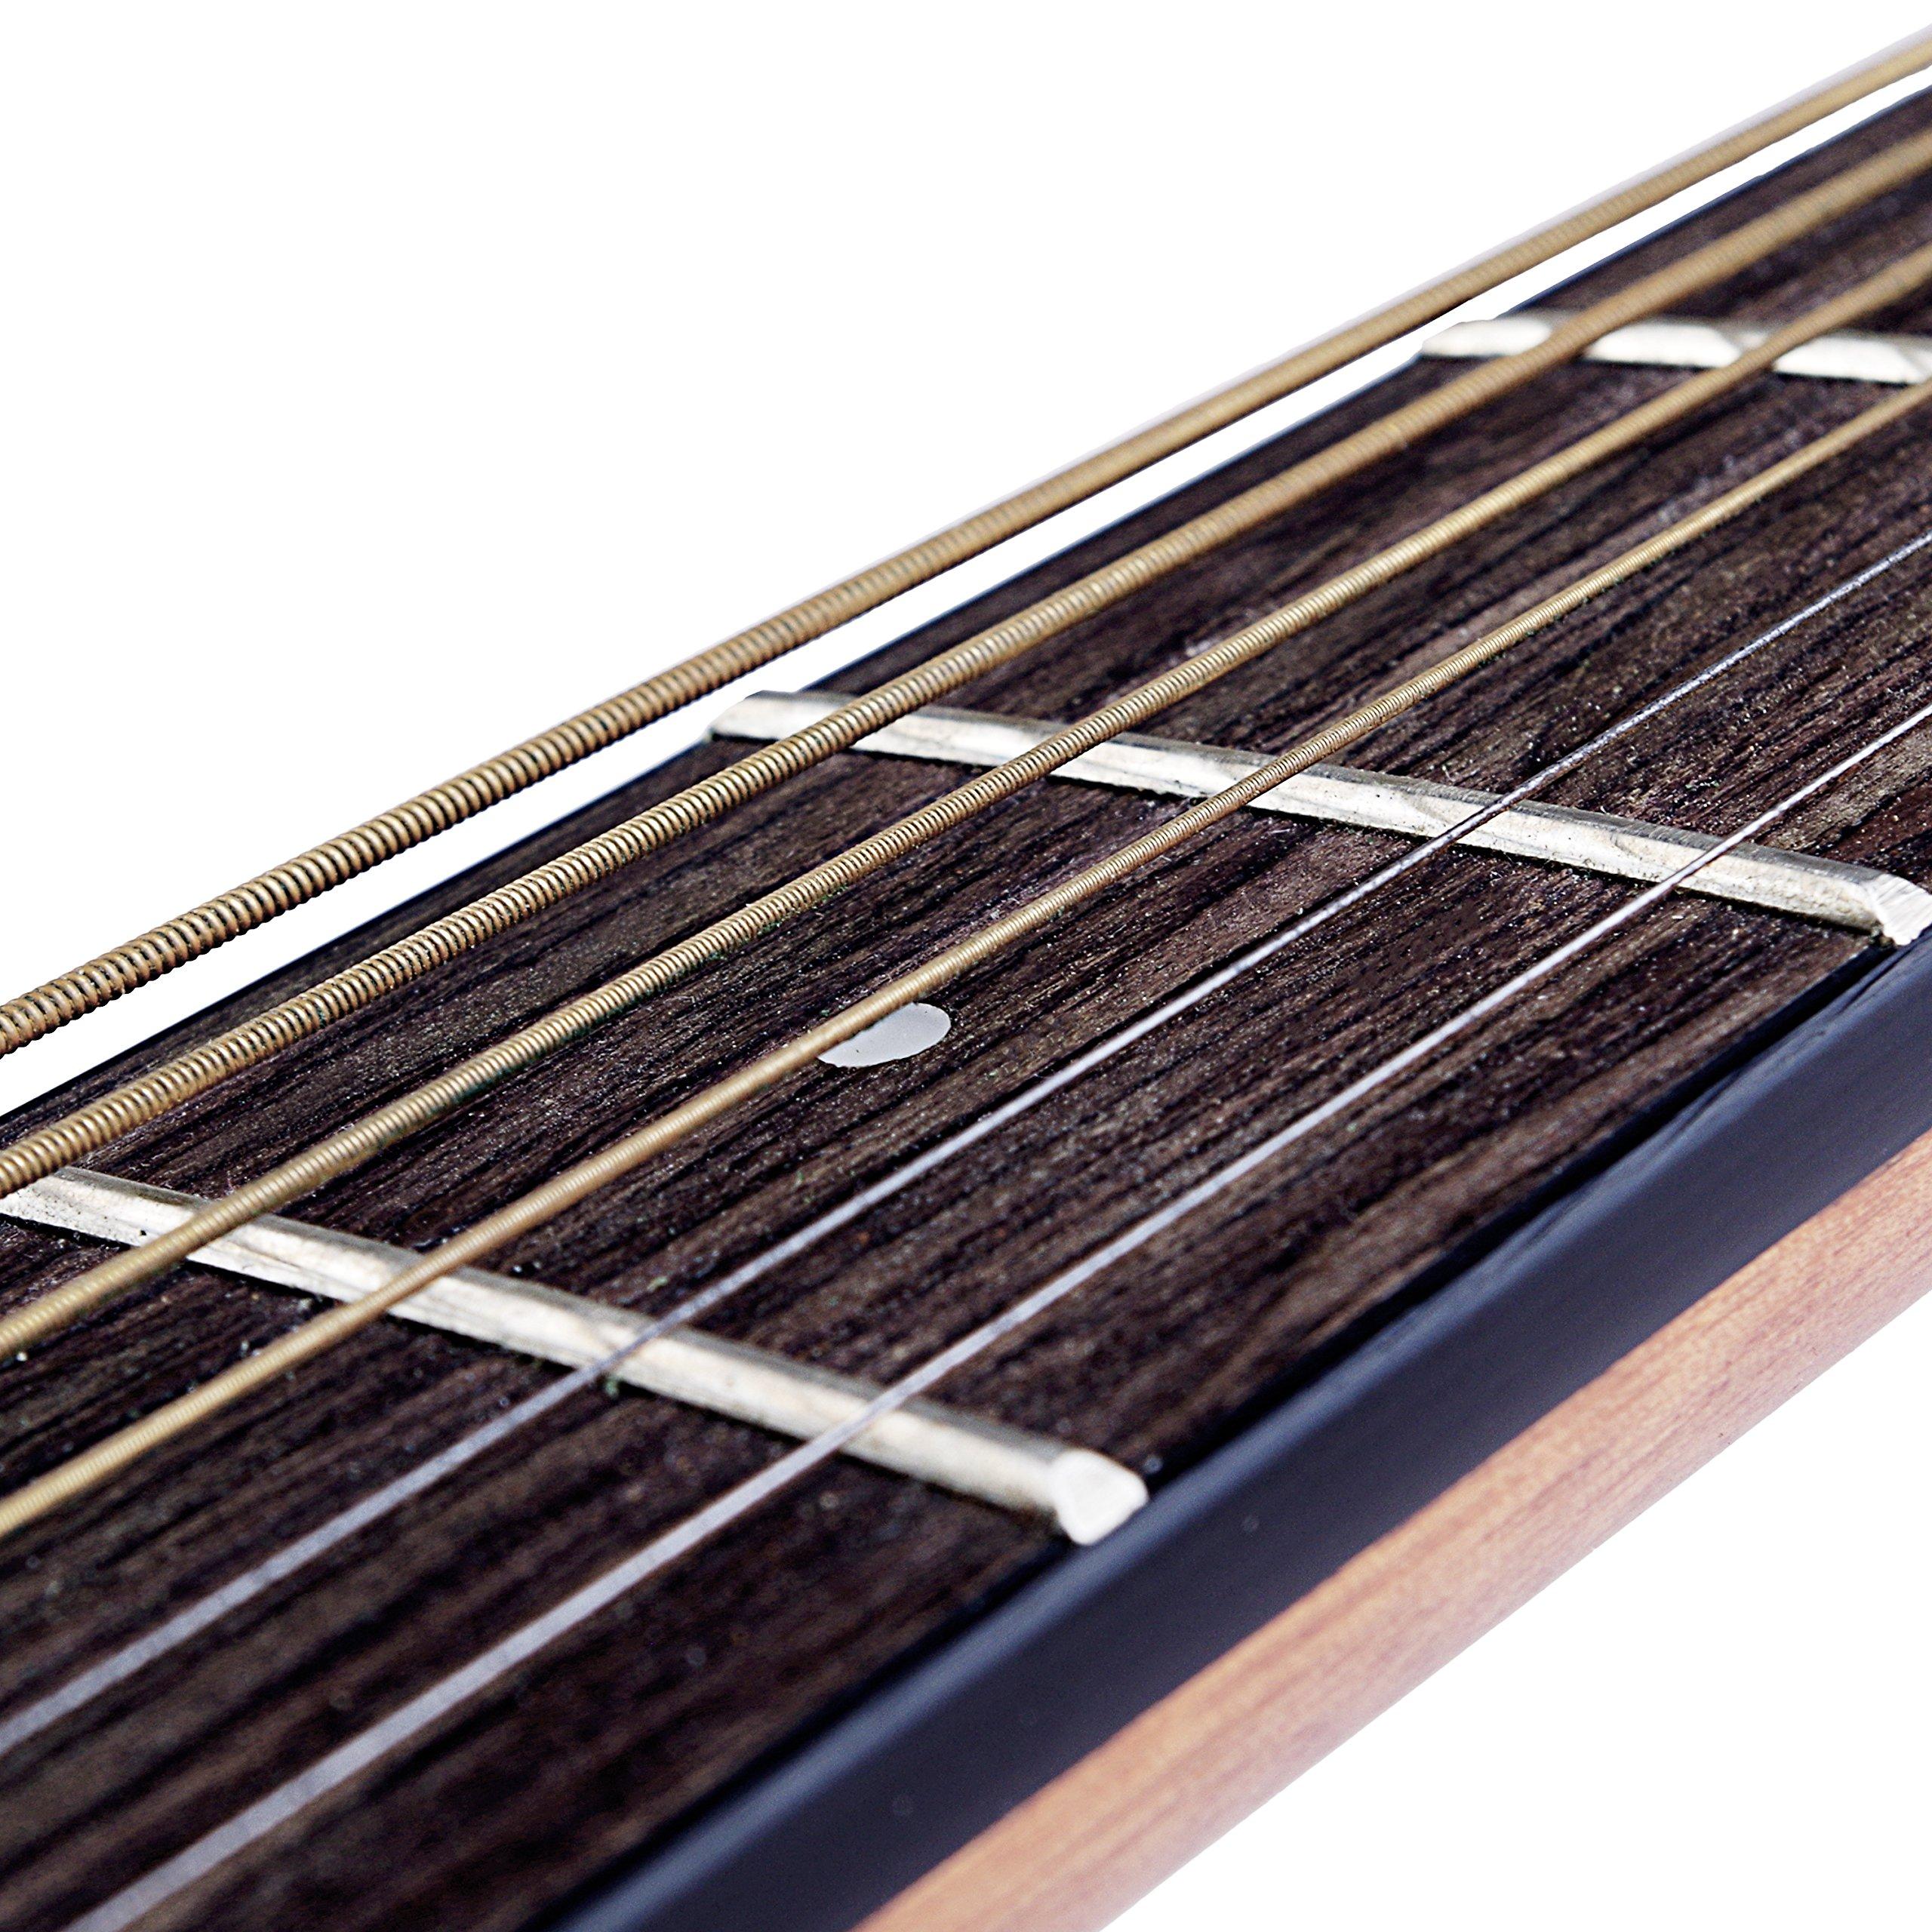 Acoustic Guitar String Mugig Korean Phosphor Bronze and Steel Pack of Two